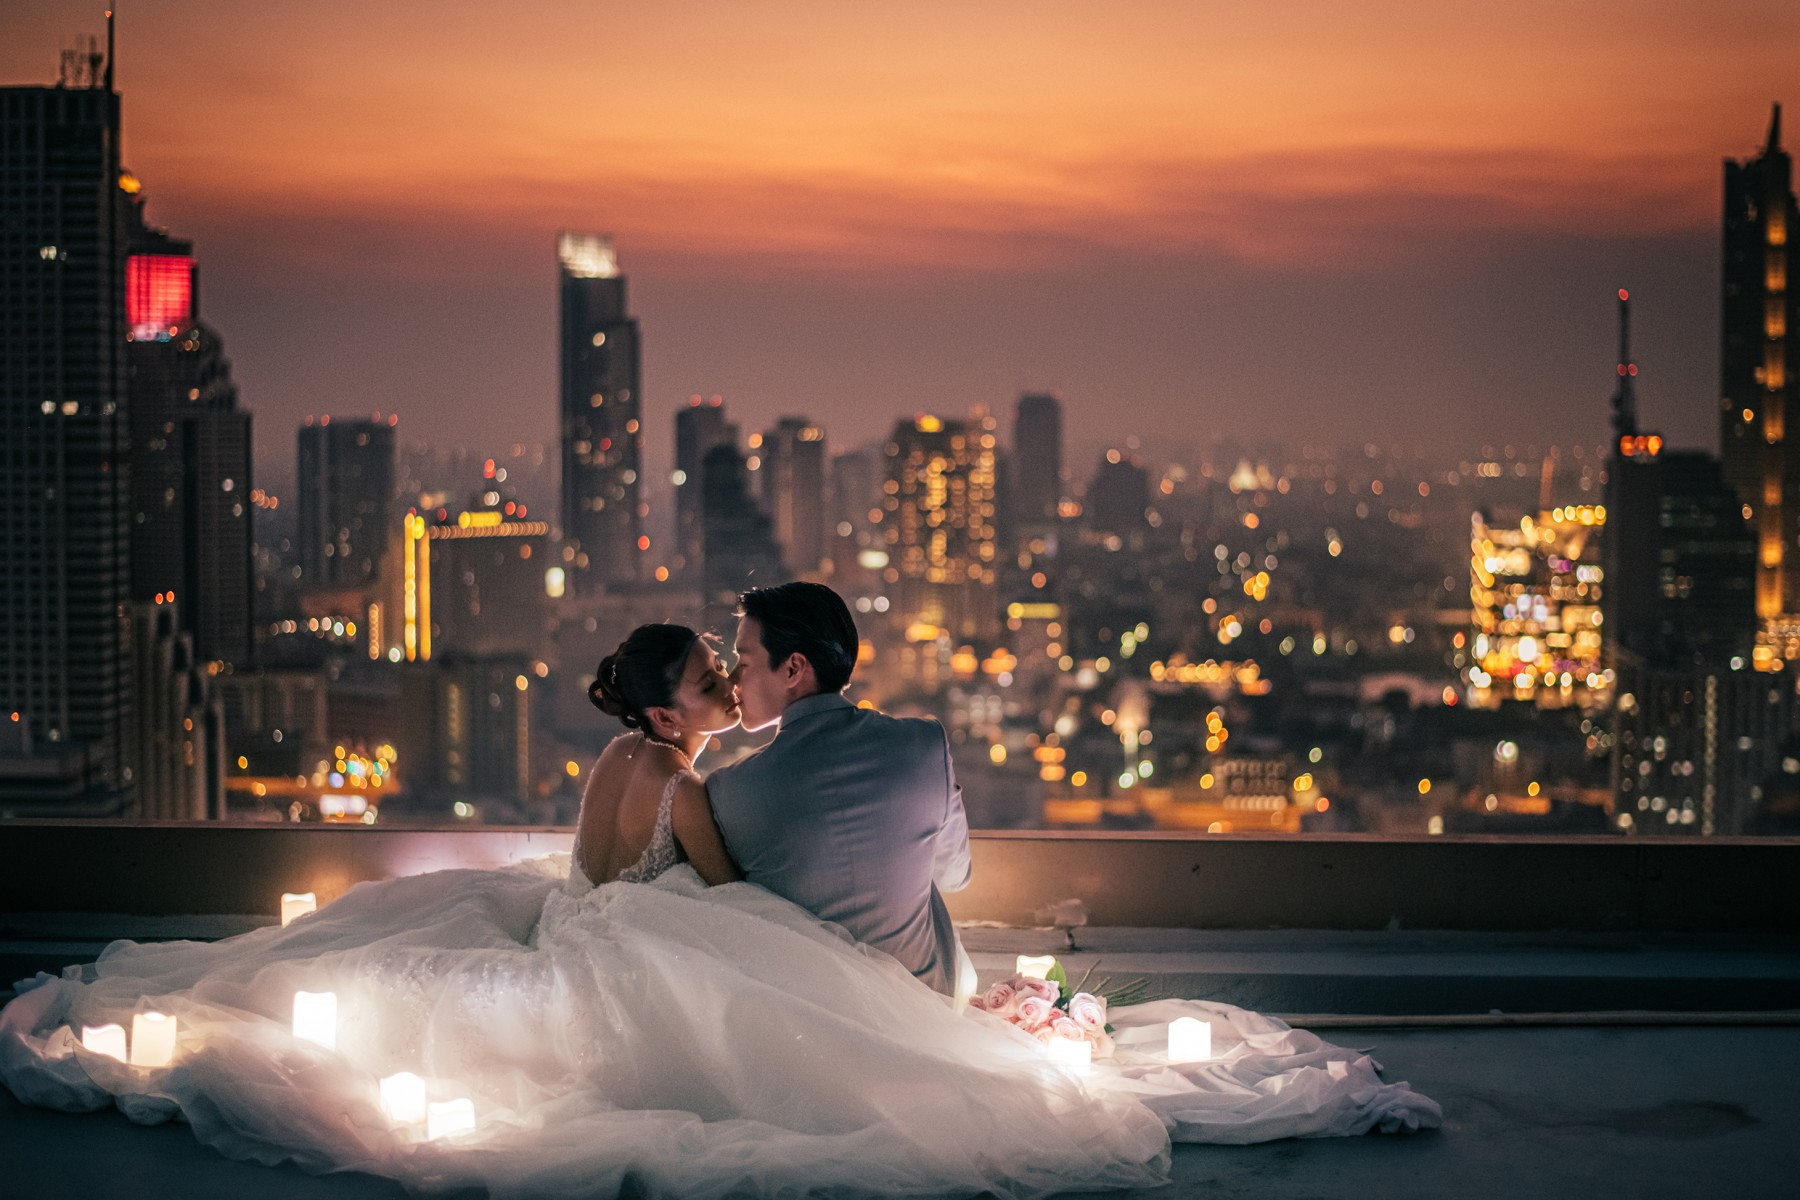 PRE-WEDDING PHOTOSHOOT PACKAGE